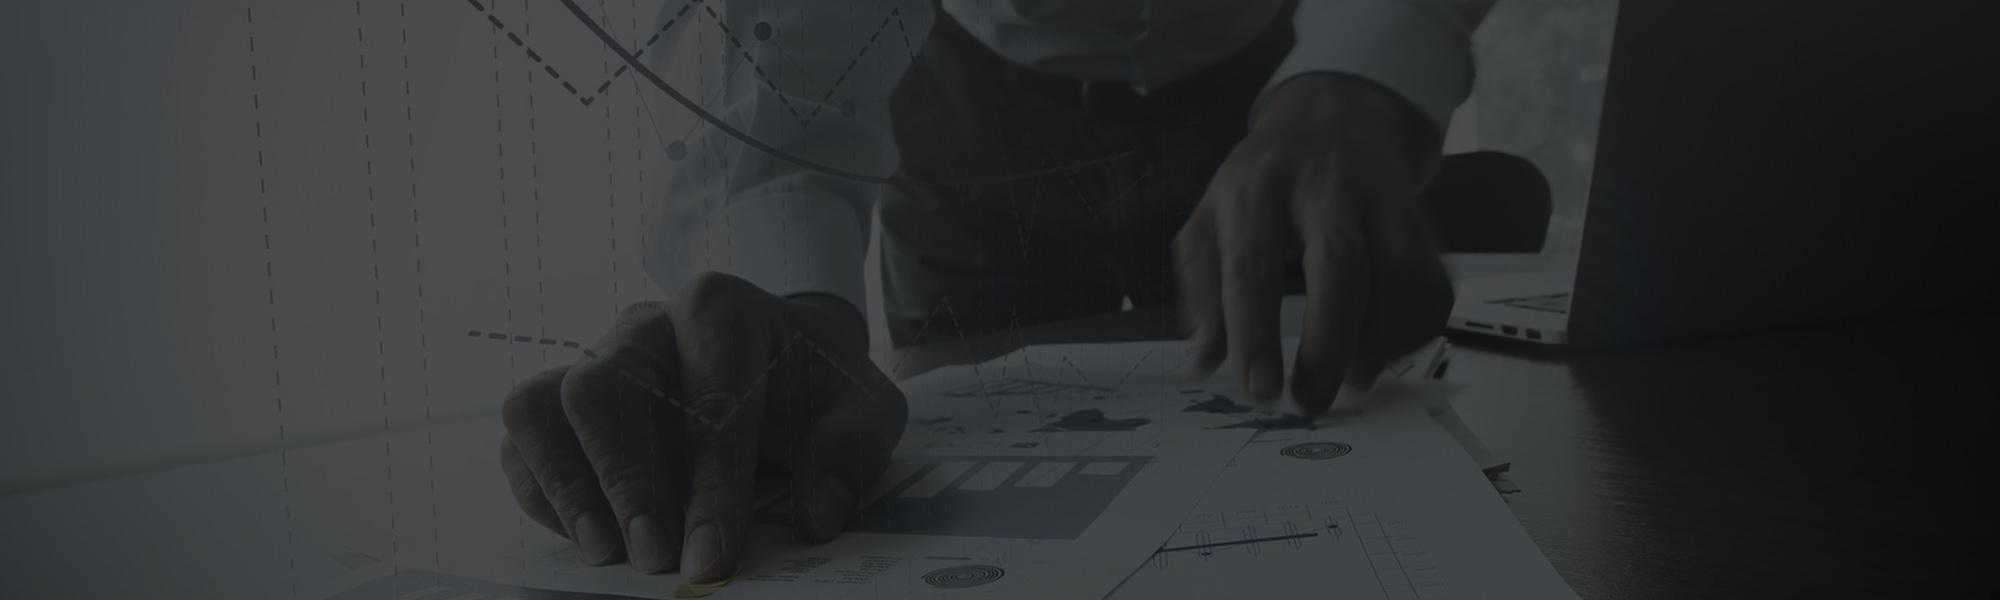 Silosmashers-Business-Intelligence-Solutions